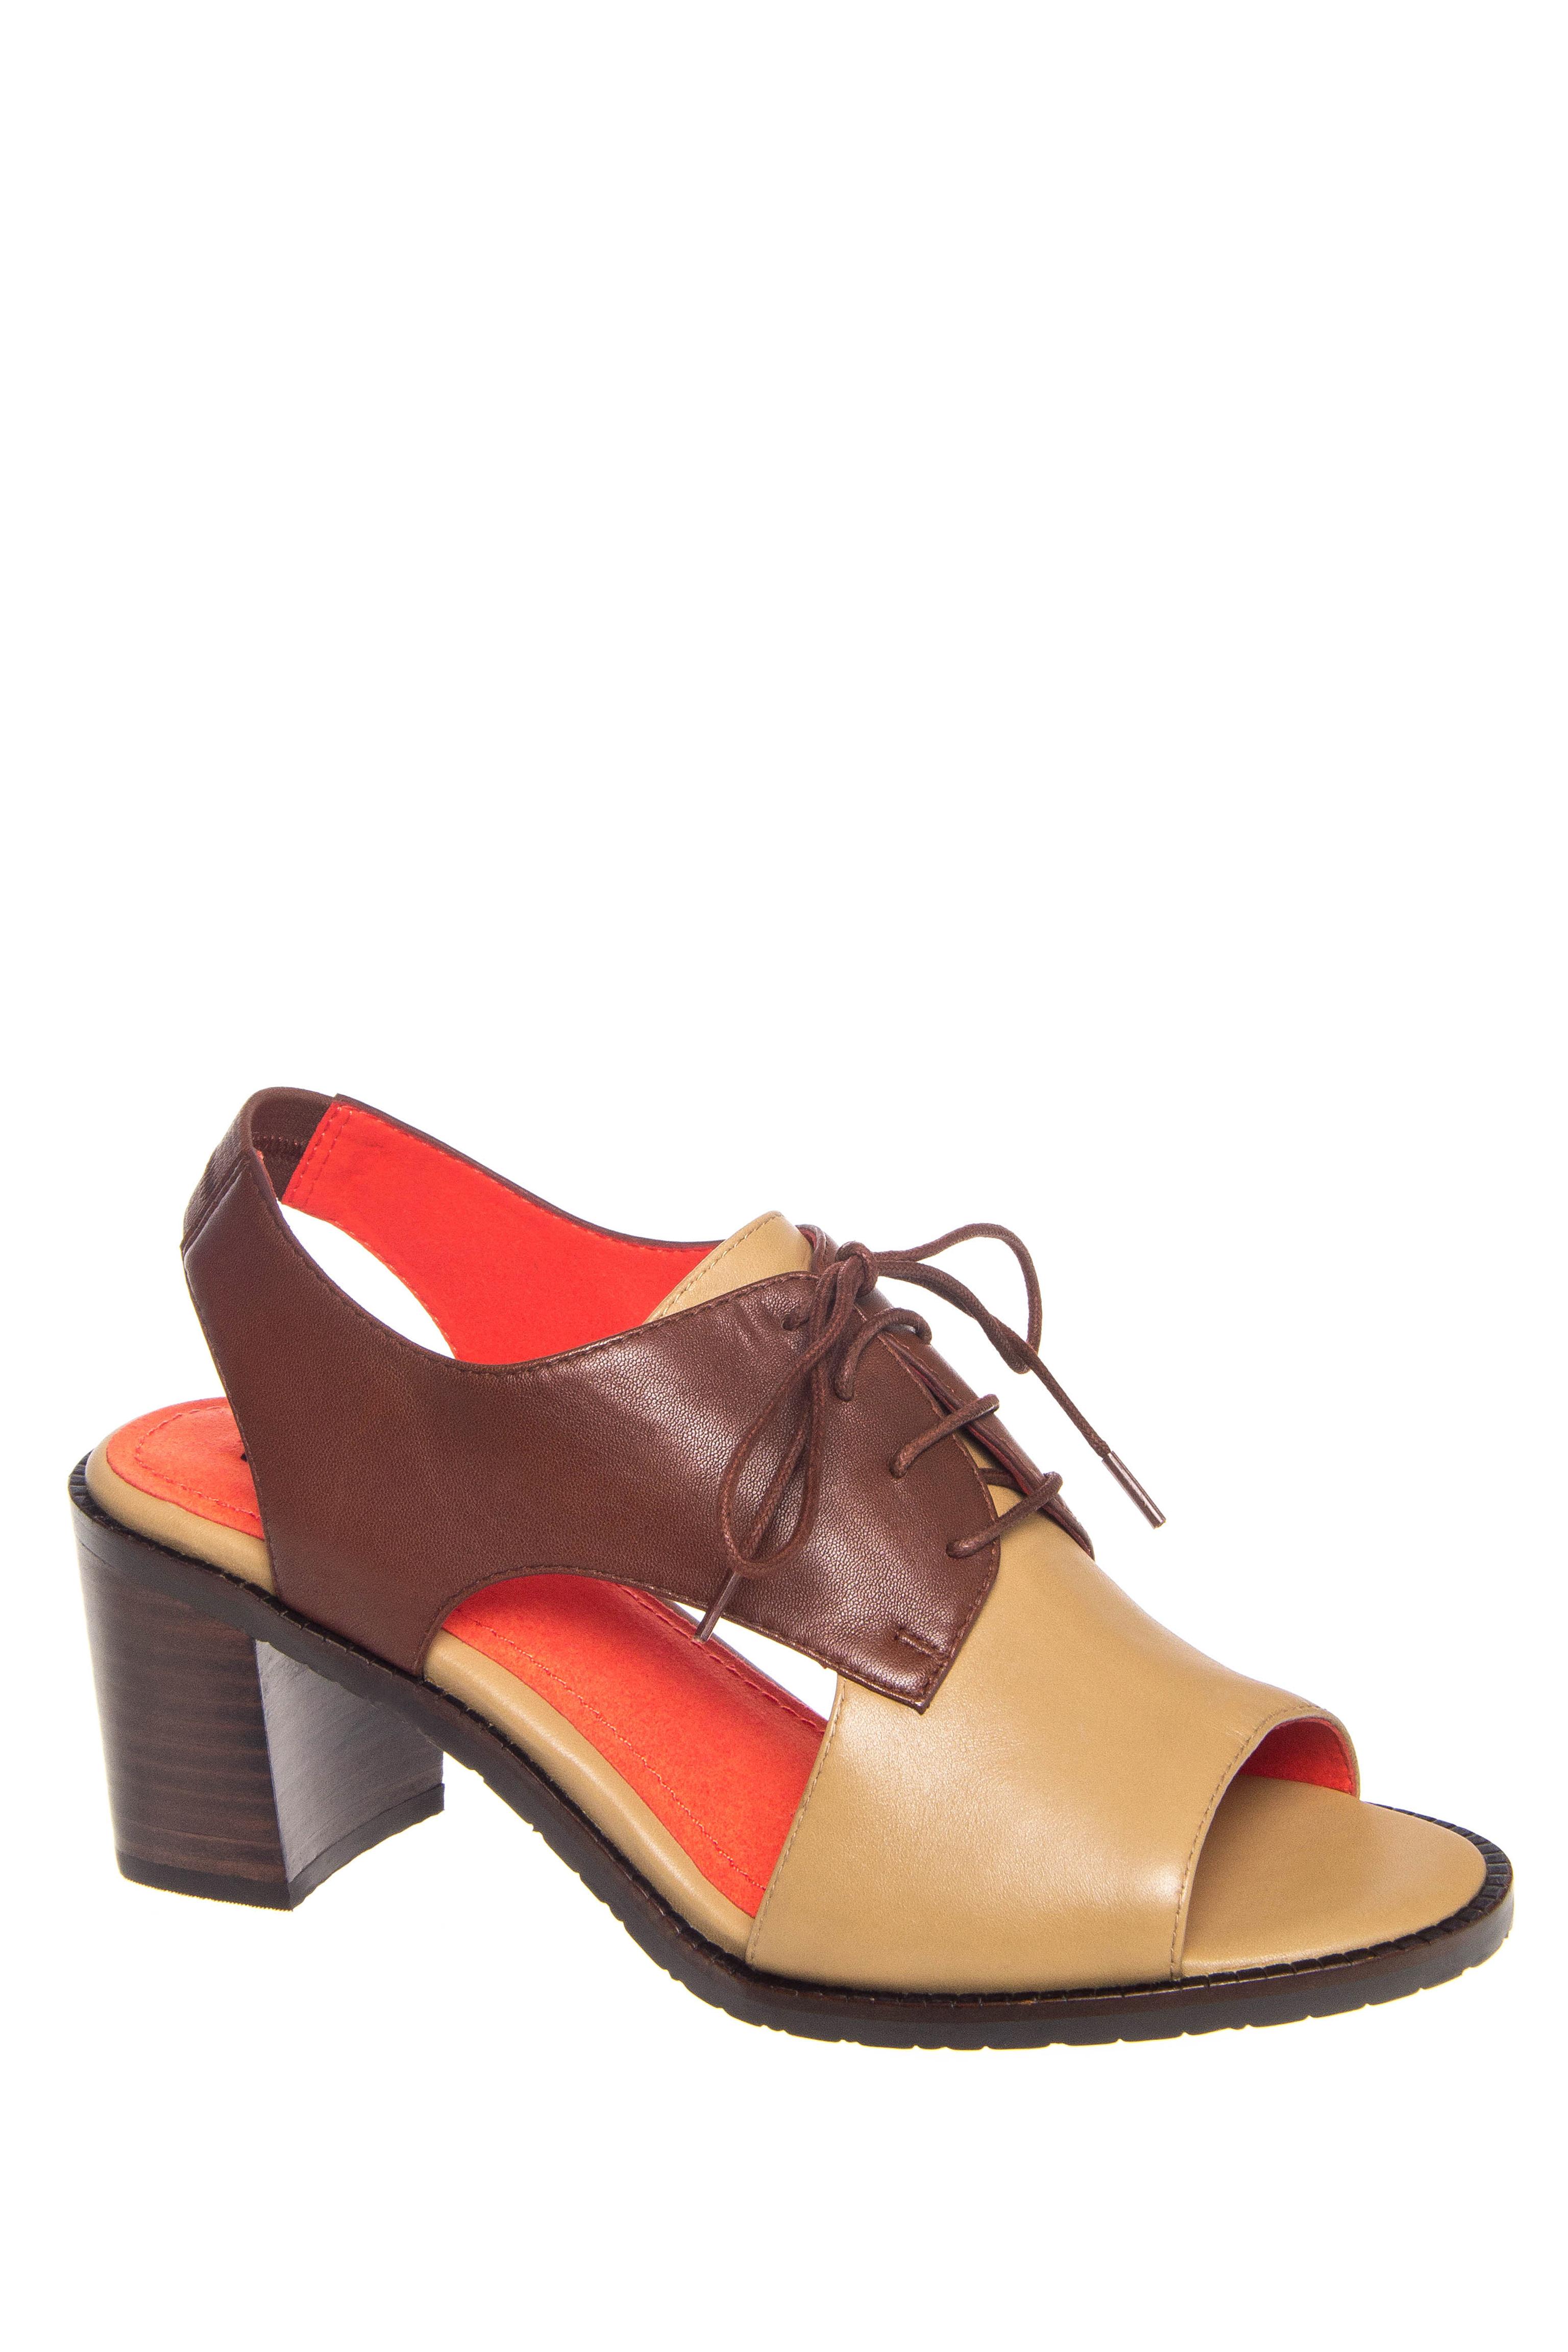 M. Maccari Cora Mid Heel Open Toe Sandals